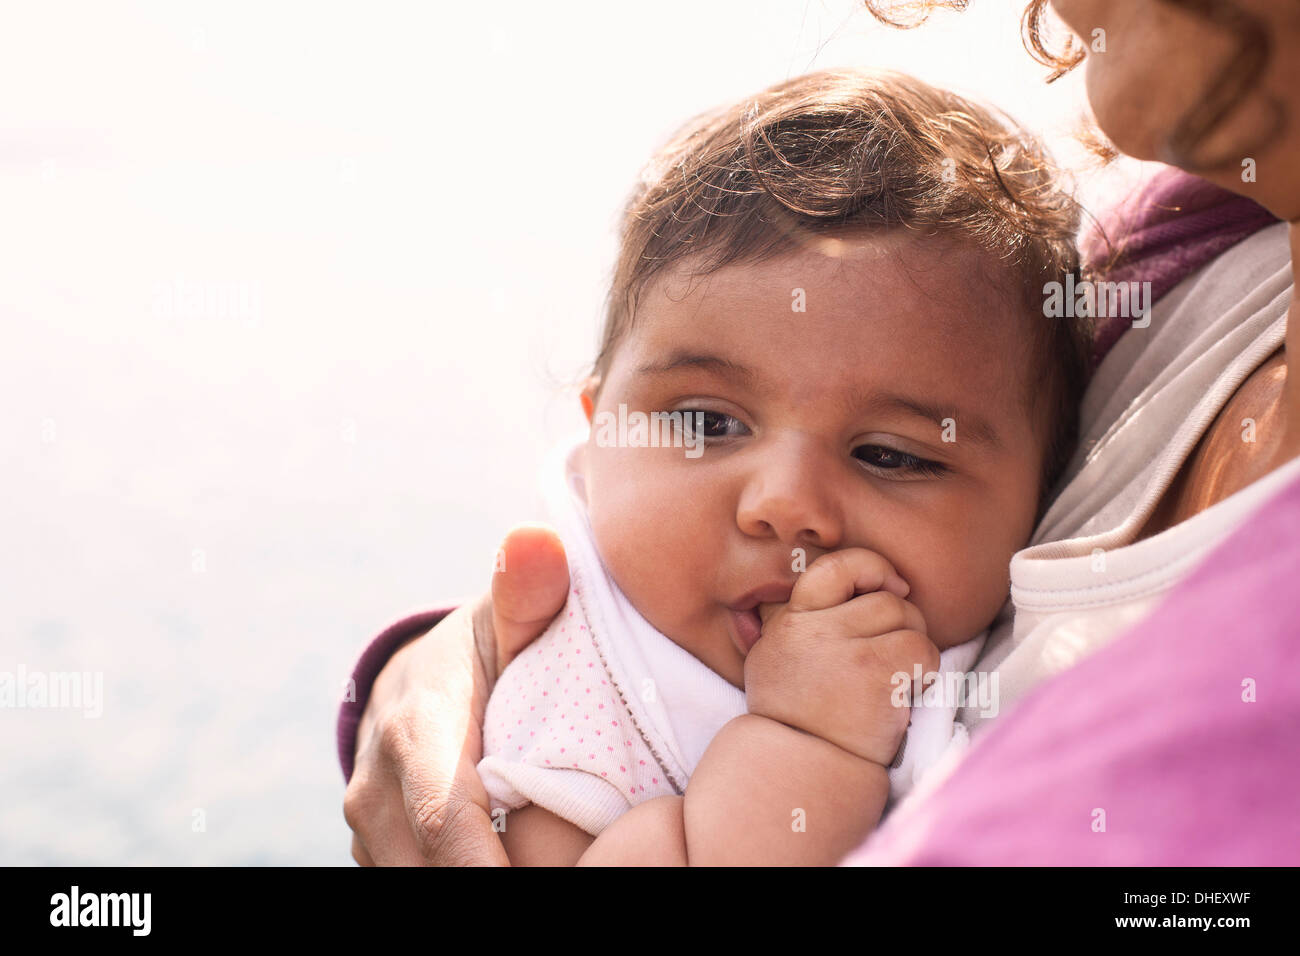 Mother cuddling baby girl - Stock Image